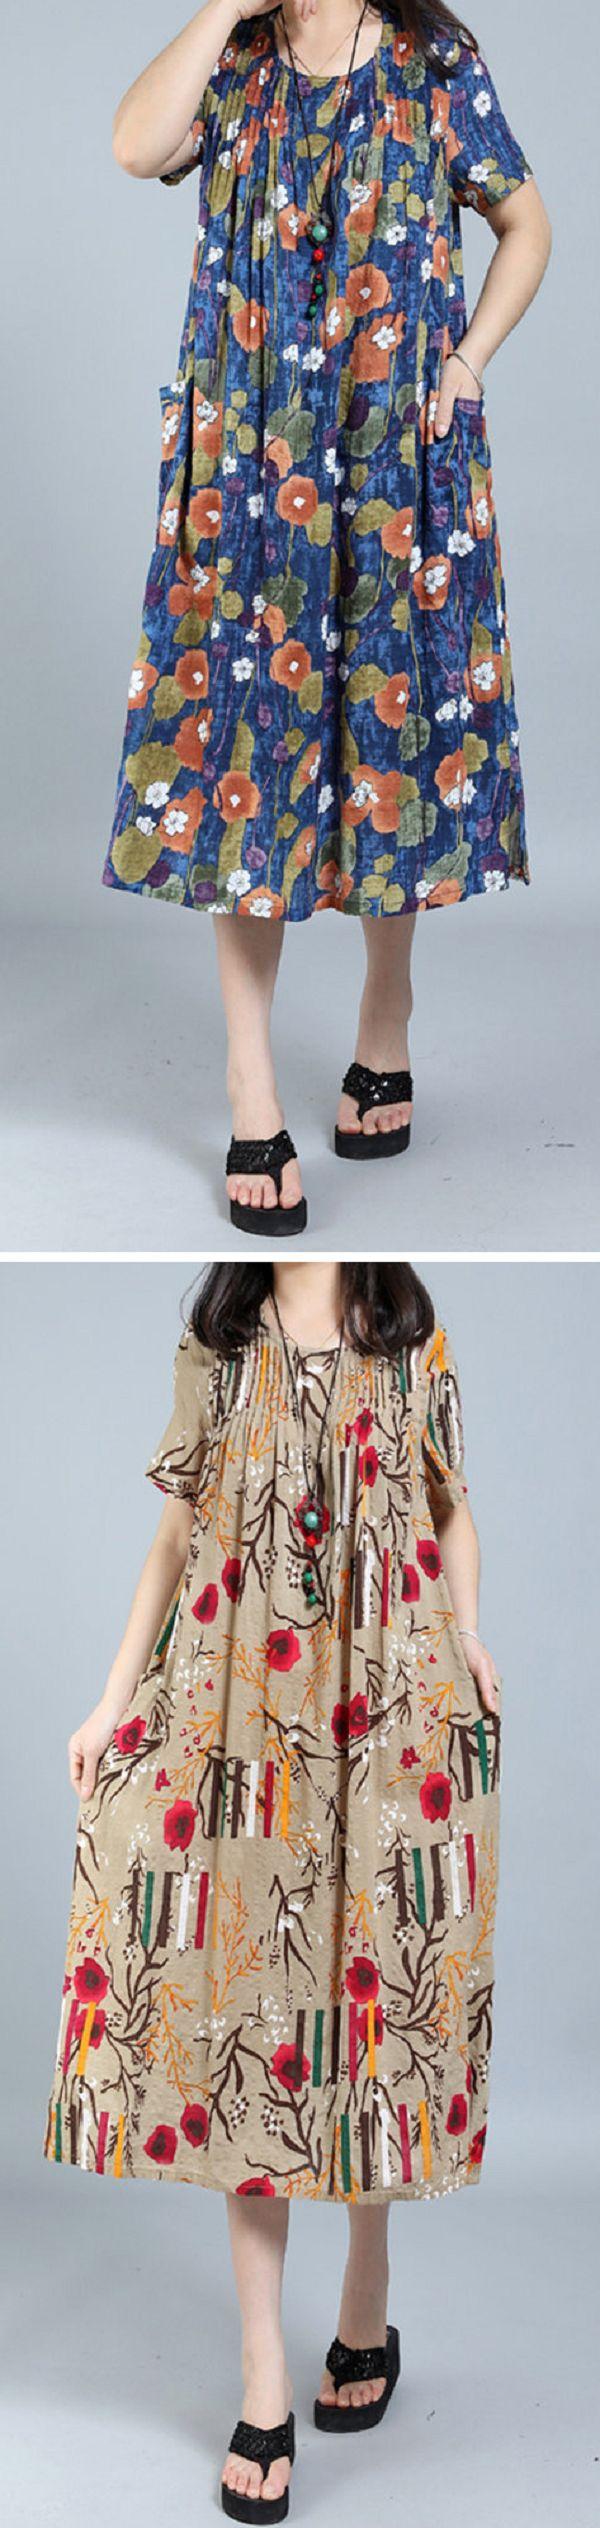 US$ 21.71 O-NEWE Printed O-Neck Short Sleeve Ruffled Pockets Dress For Women